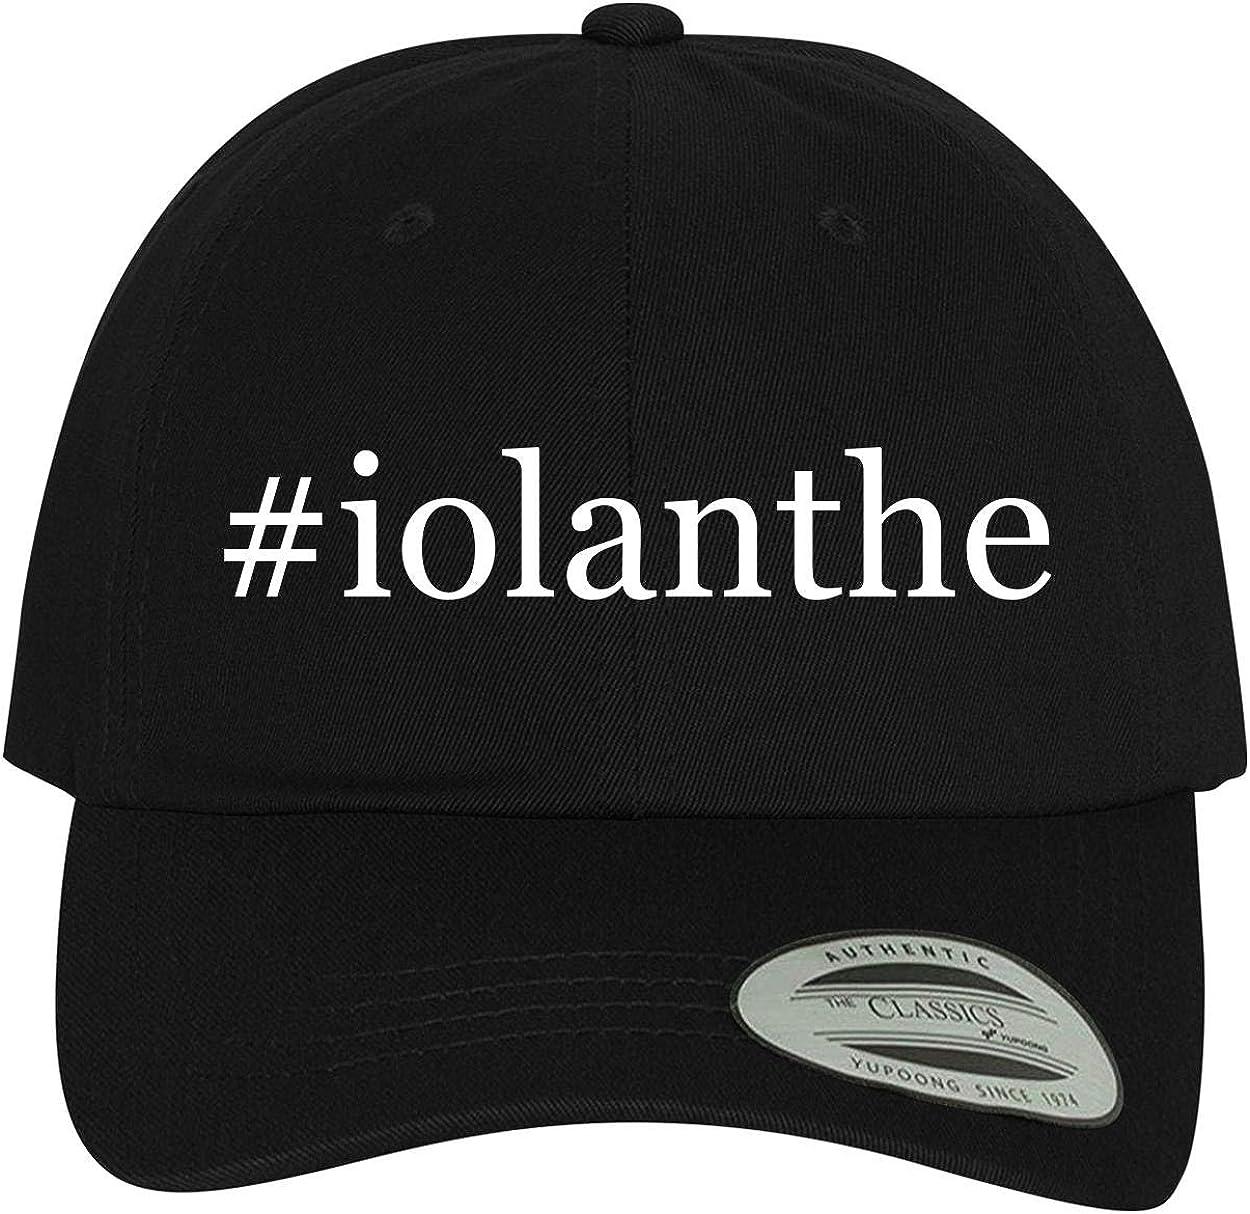 Comfortable Dad Hat Baseball Cap BH Cool Designs #Iolanthe